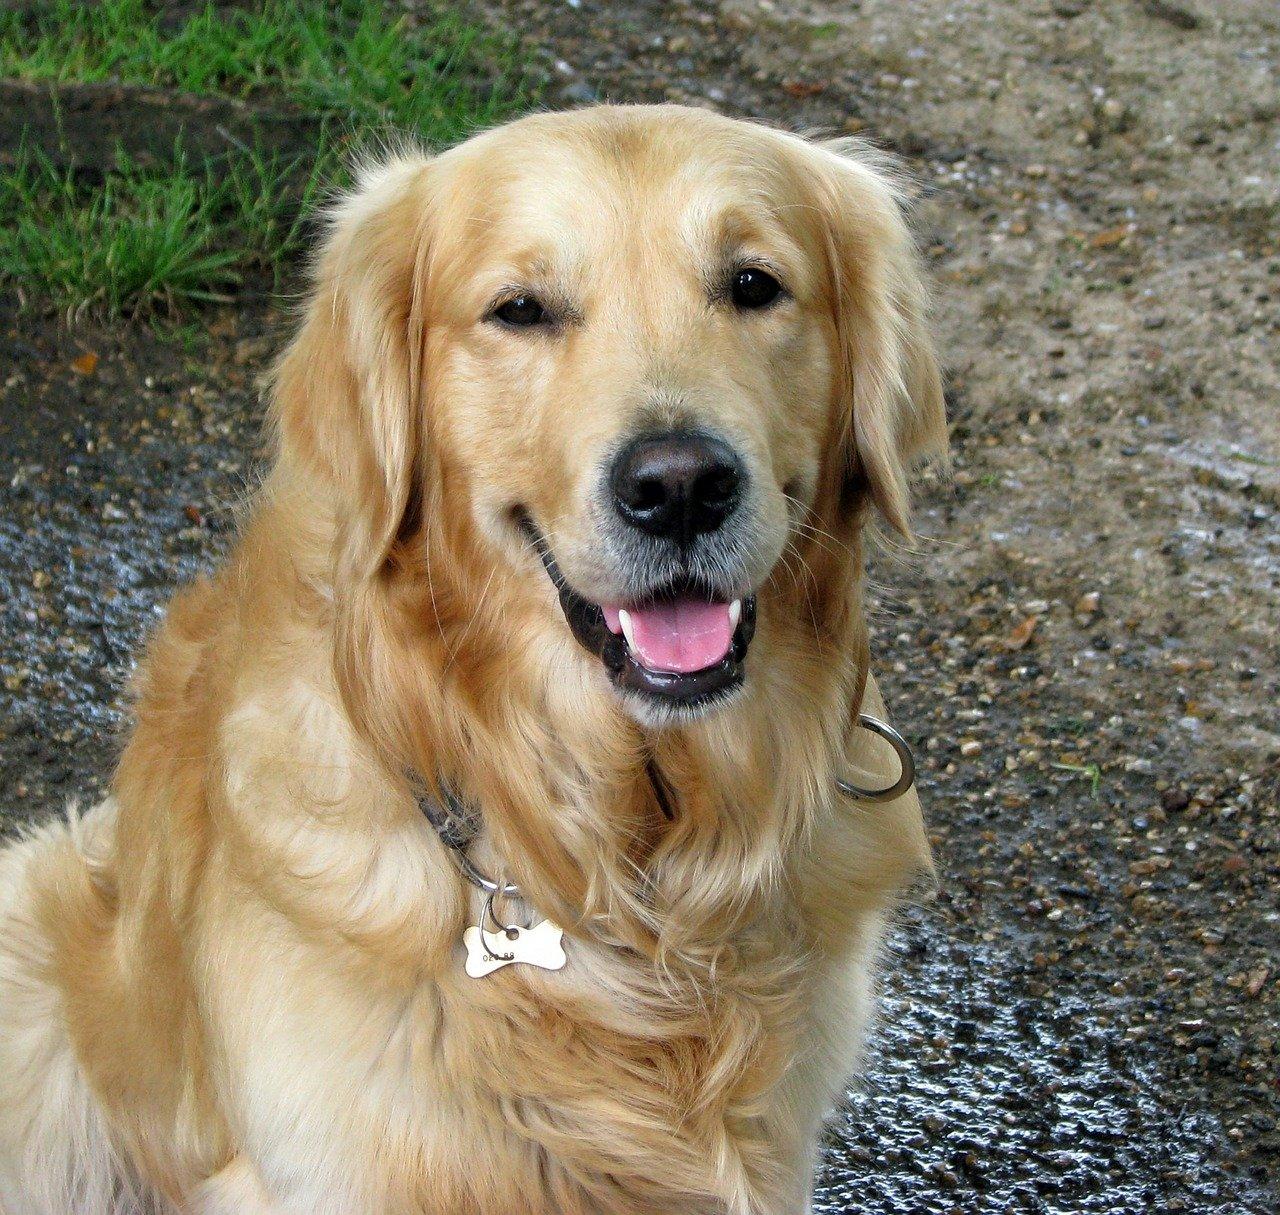 Razze cane: il cane Golden Retriever